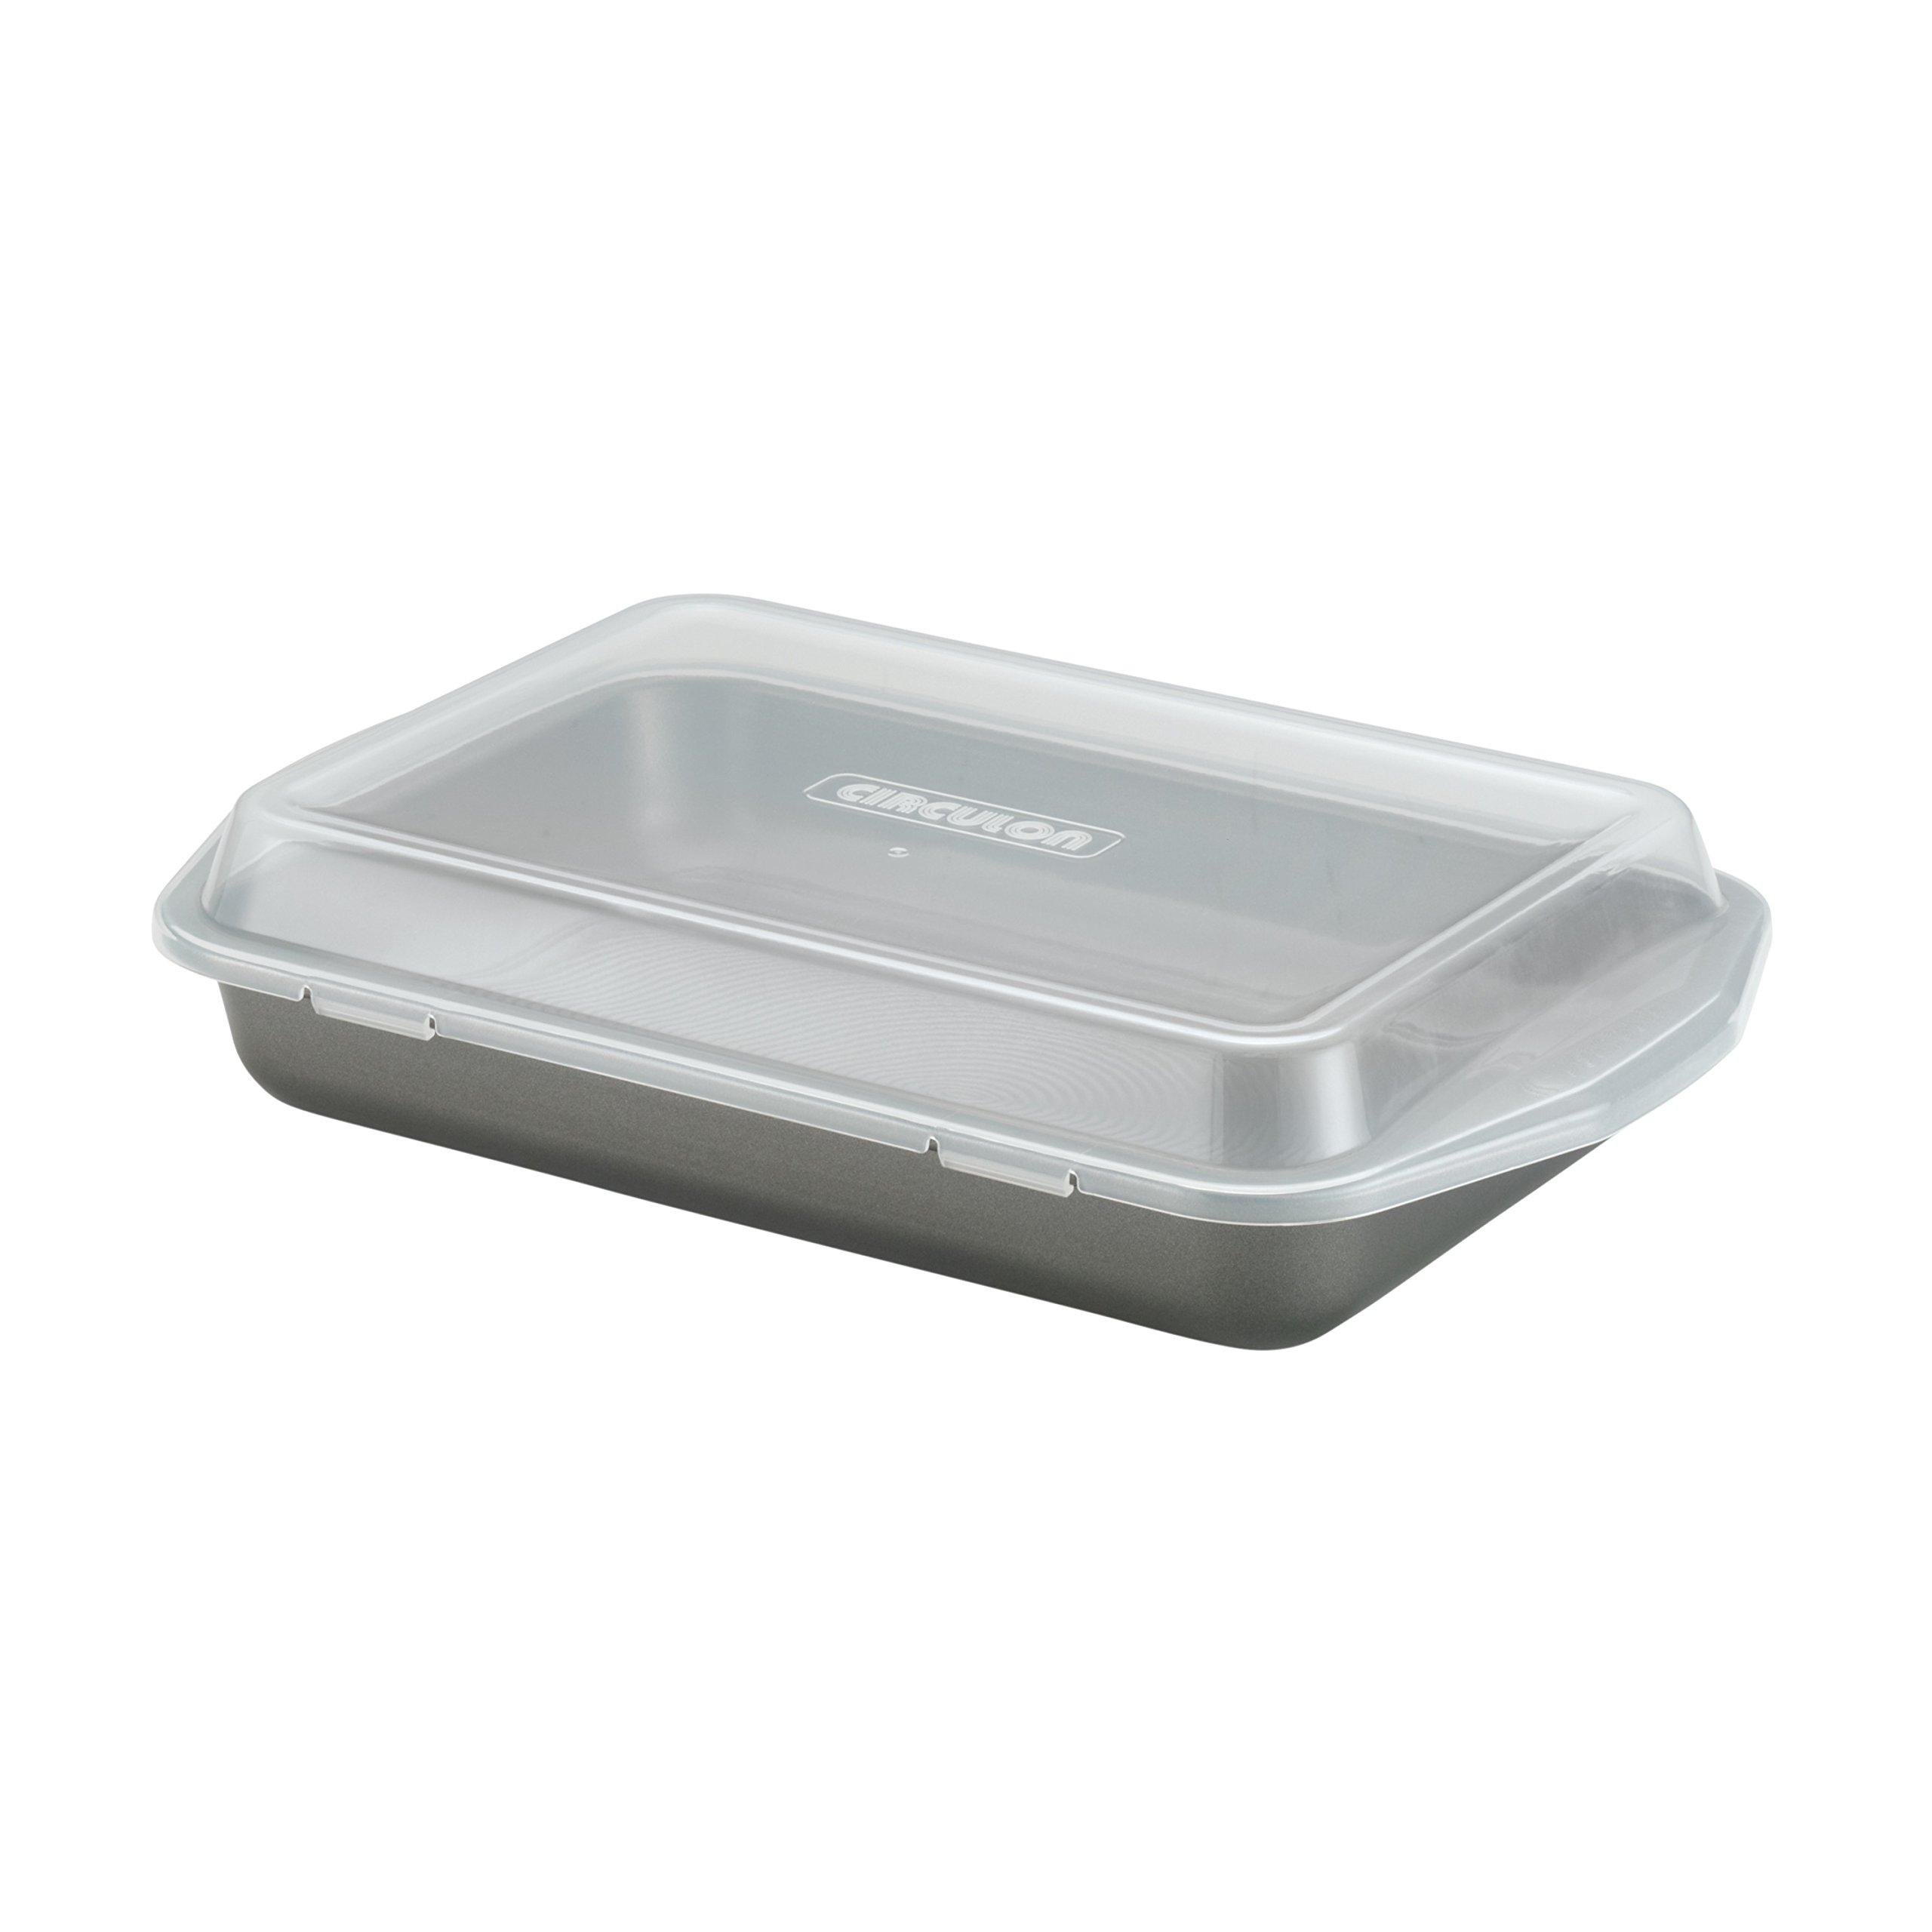 Circulon 57968 Bakeware Cake Pan, 9'' x 13'' with Lid by Circulon